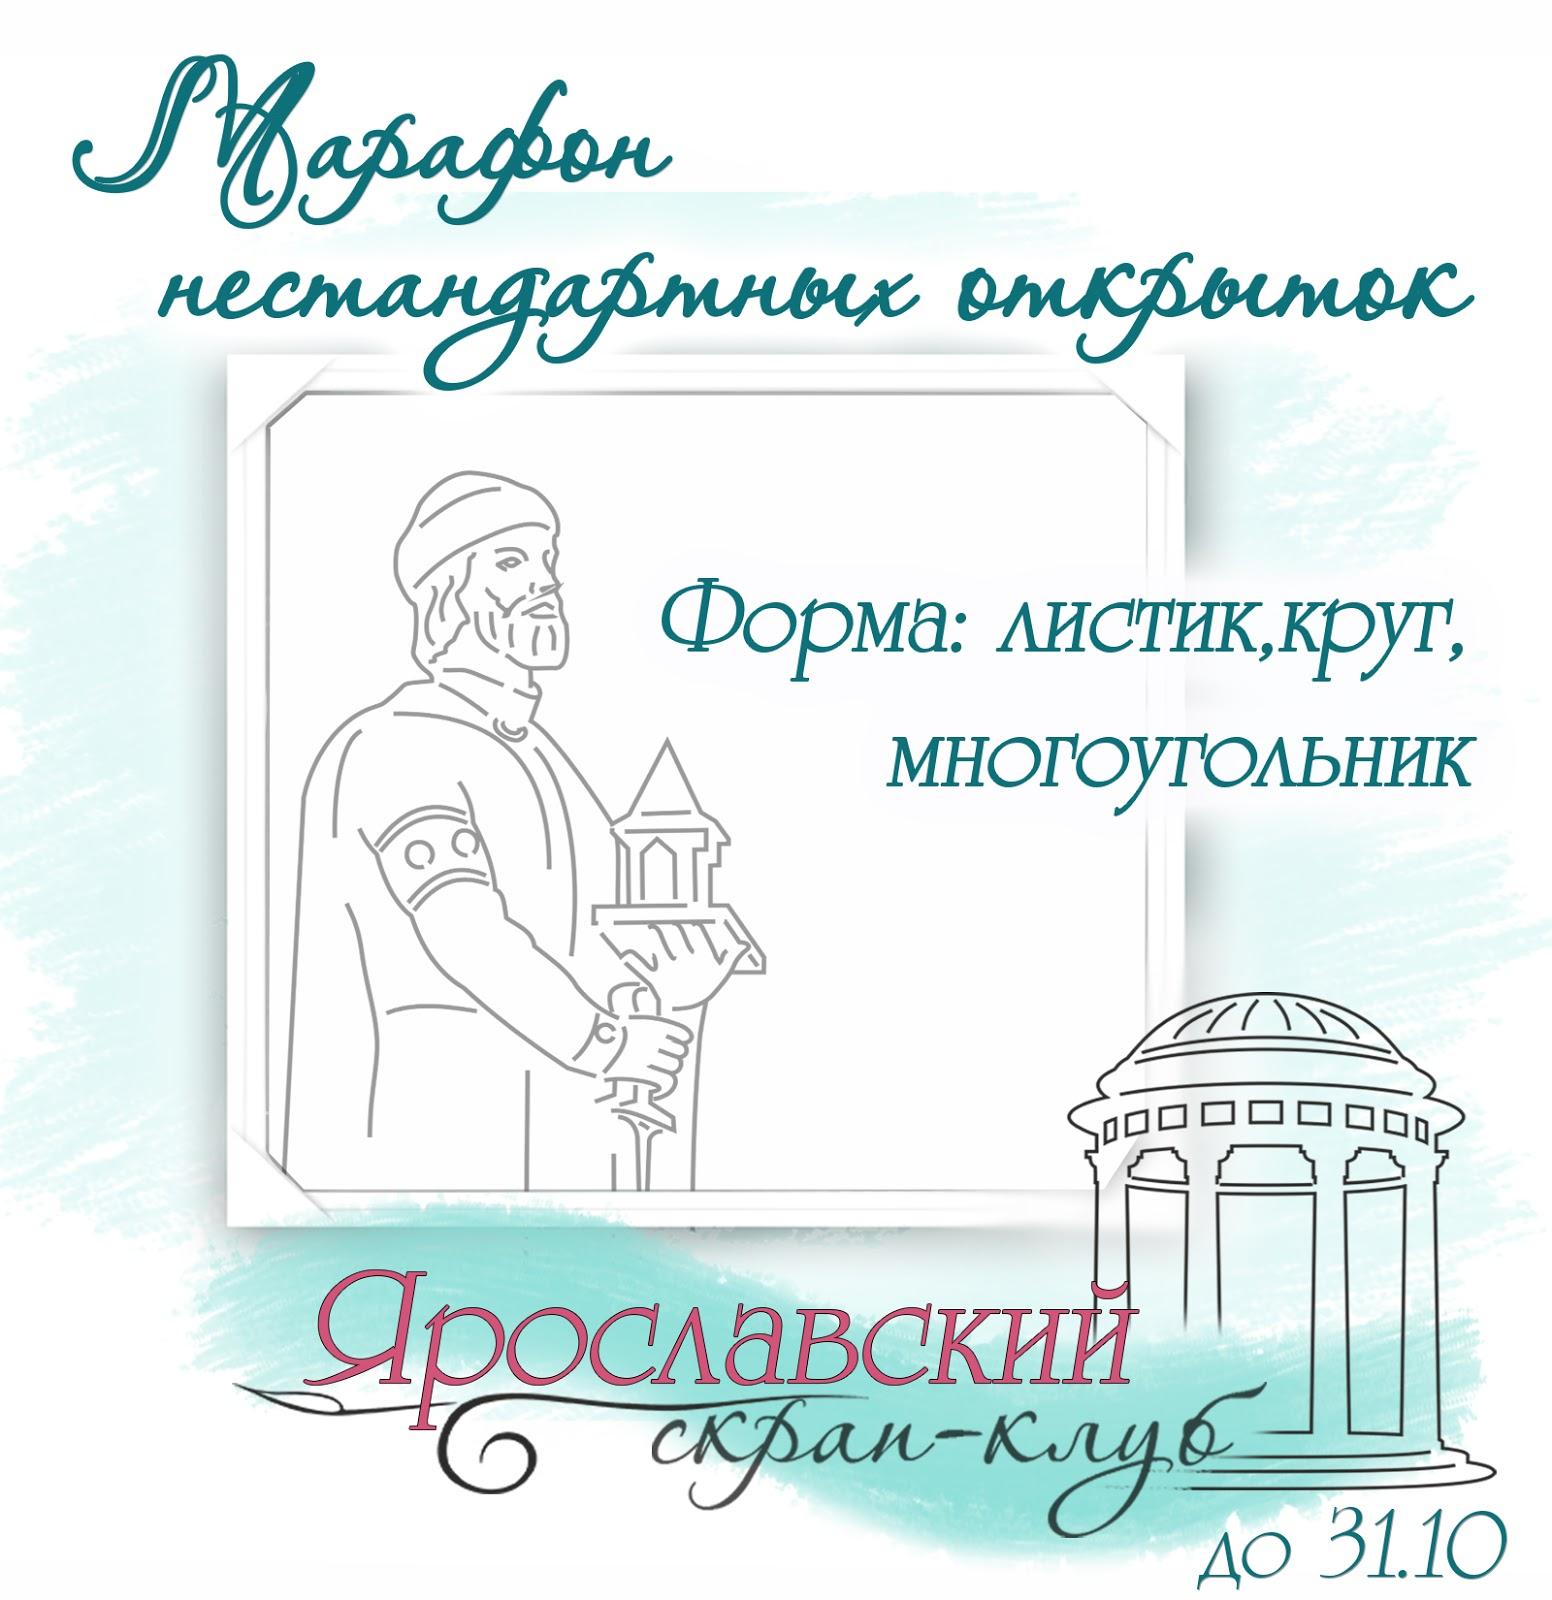 Марафон нестандартных открыток: листик, круг, многоугольник до 31.10.2018